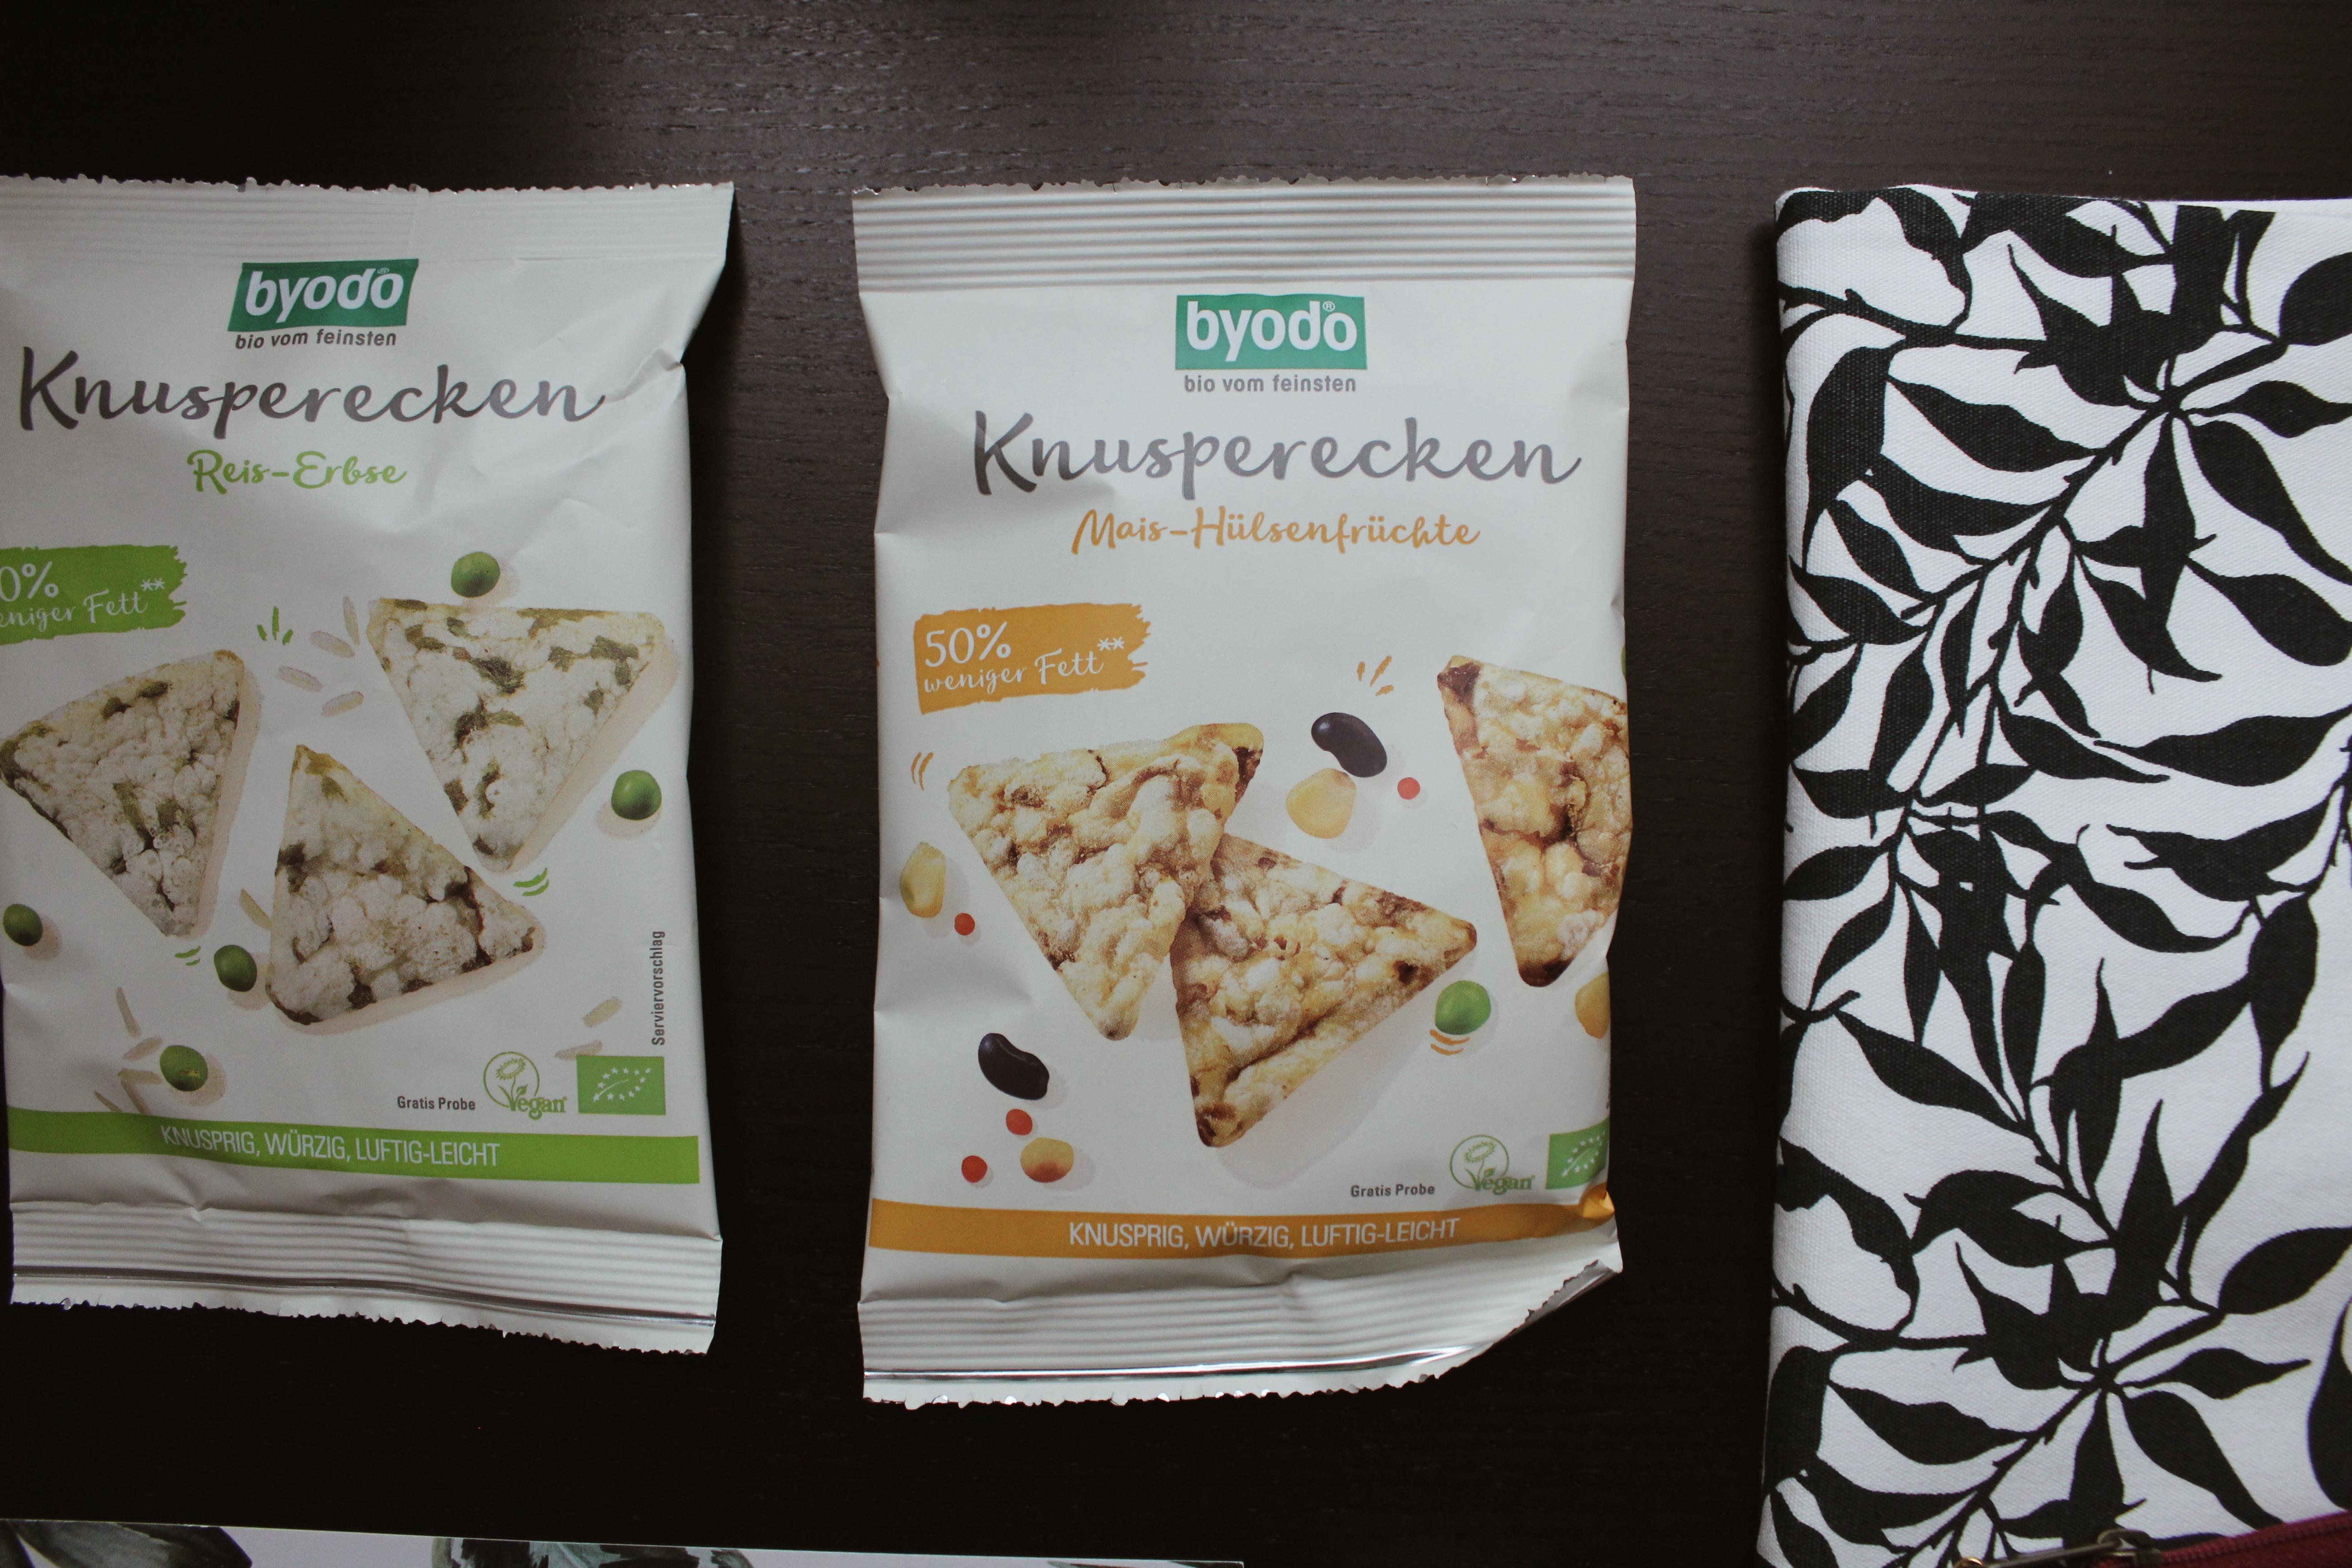 gesunder veganer Snack, Knusperecken